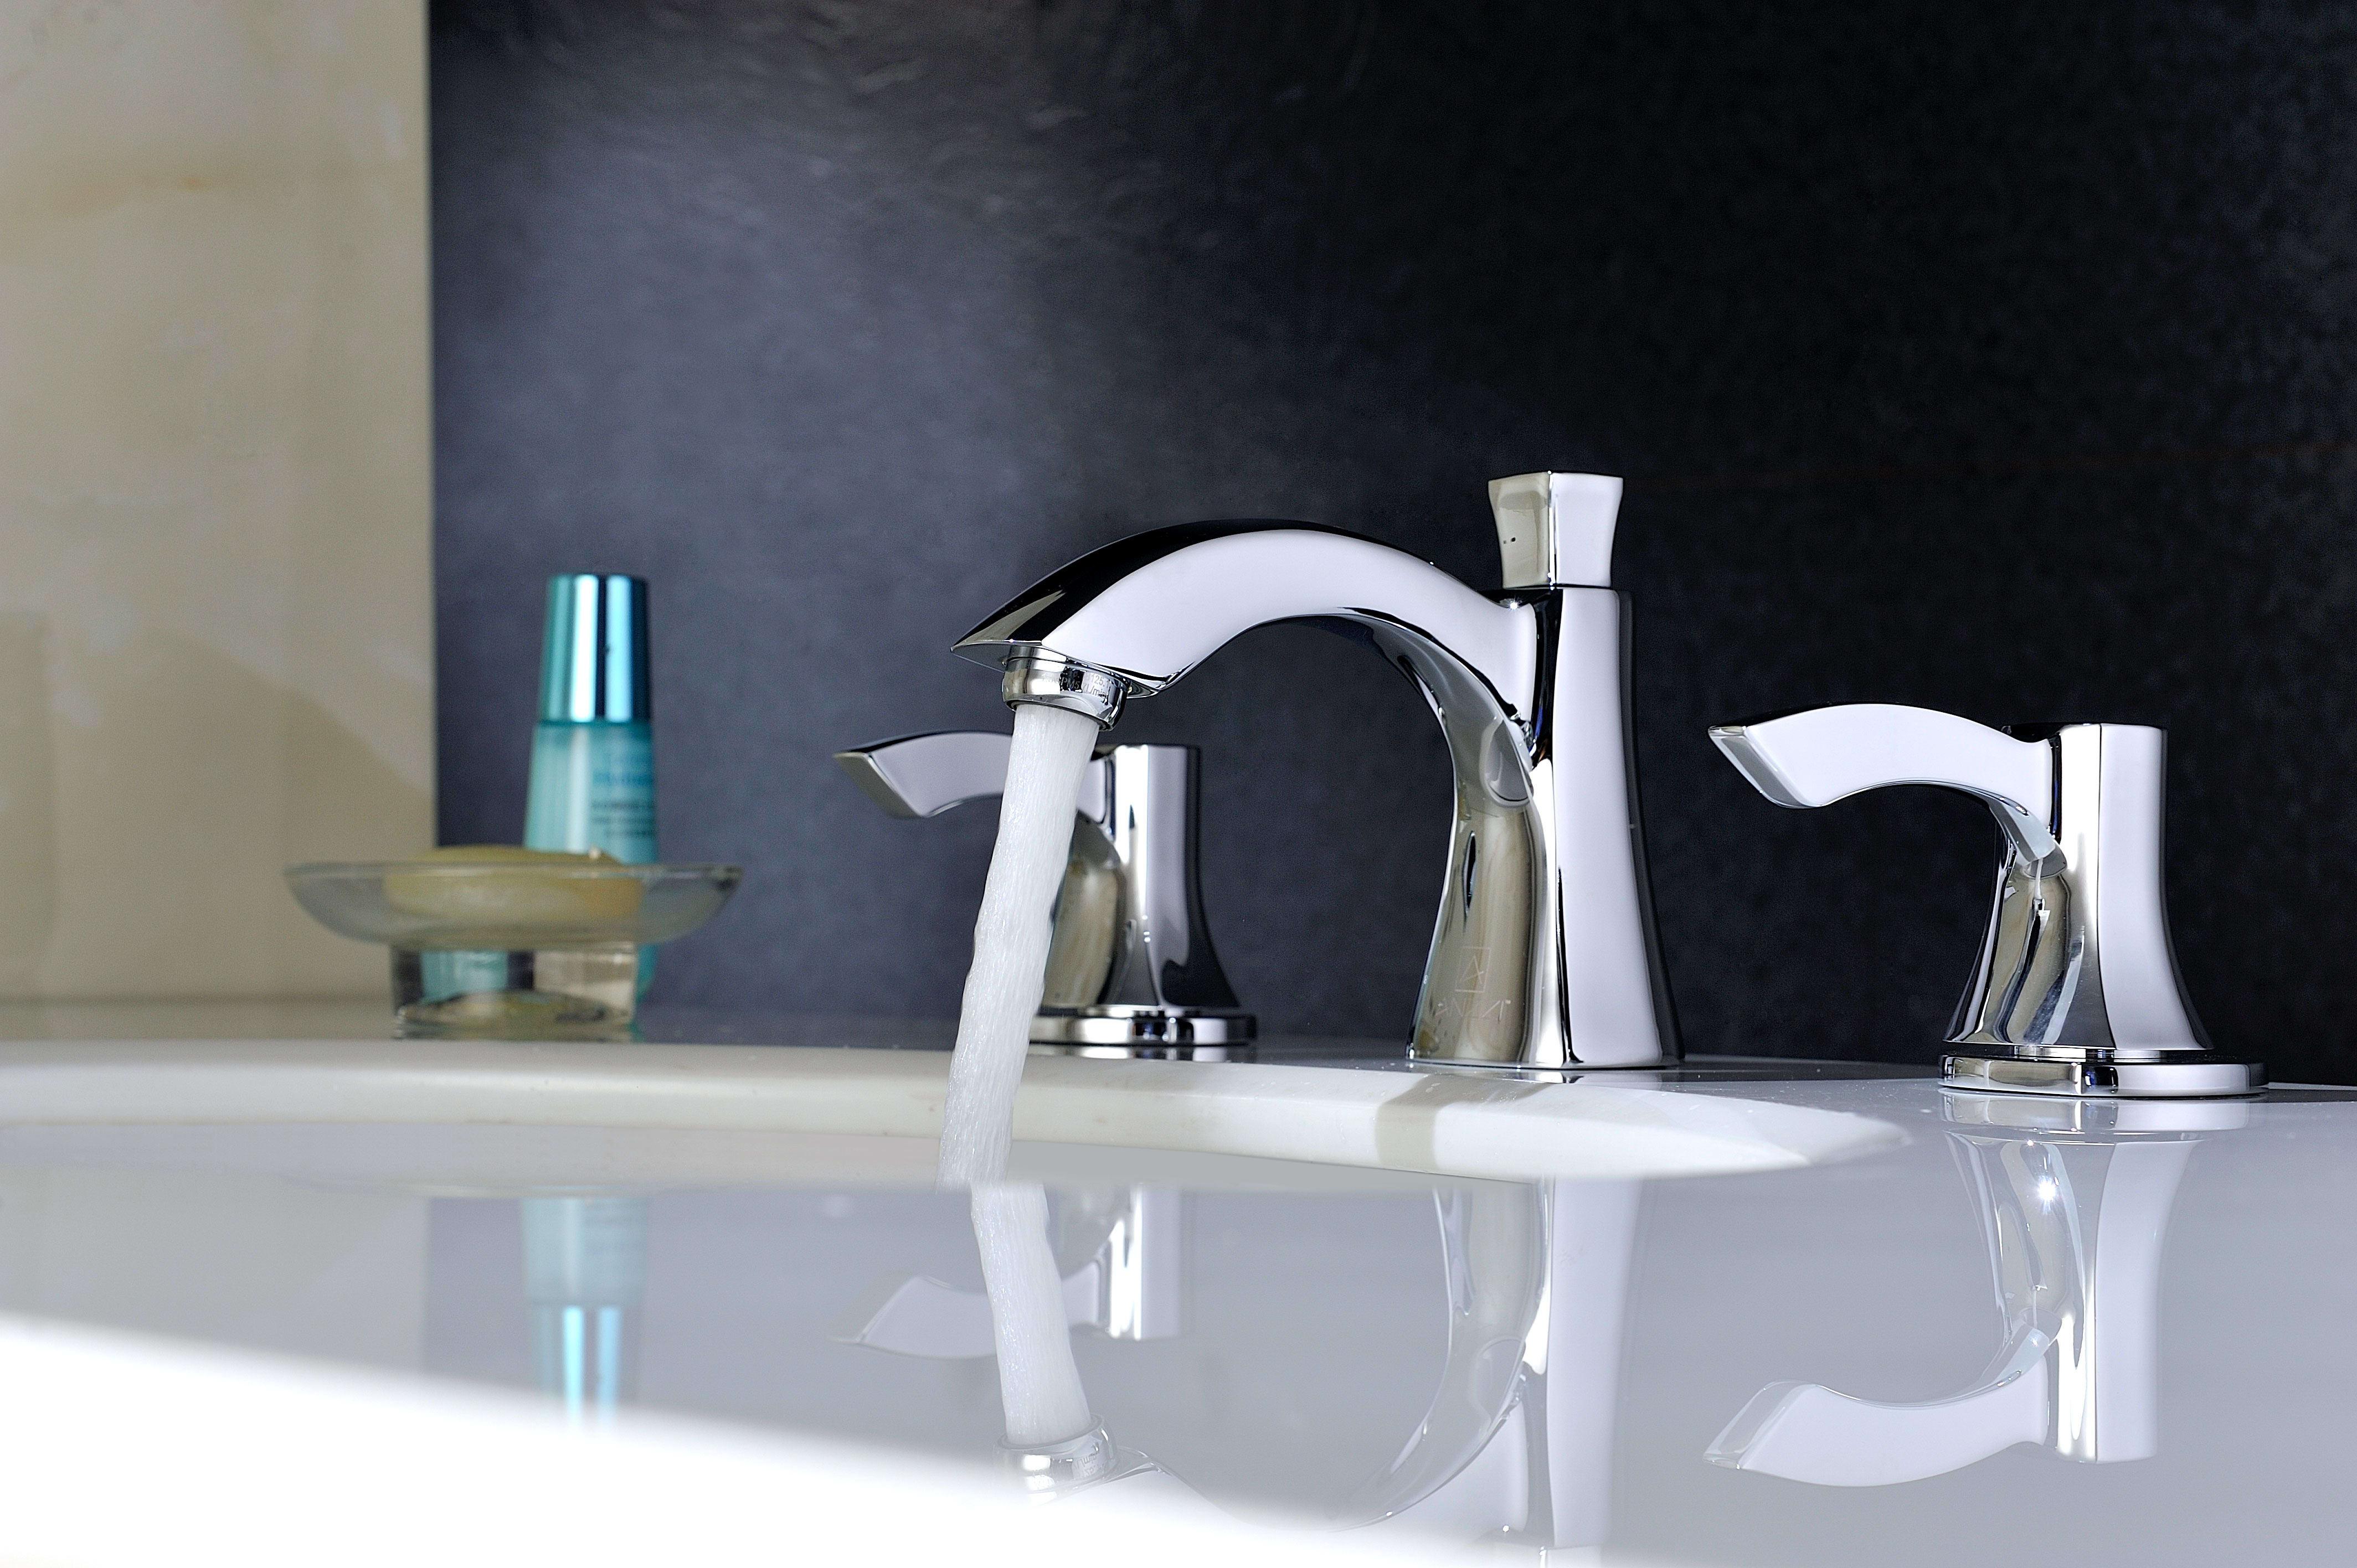 Anzzi L-AZ015 Polished Chrome Sonata Widespread 1.2 GPM Bathroom ...